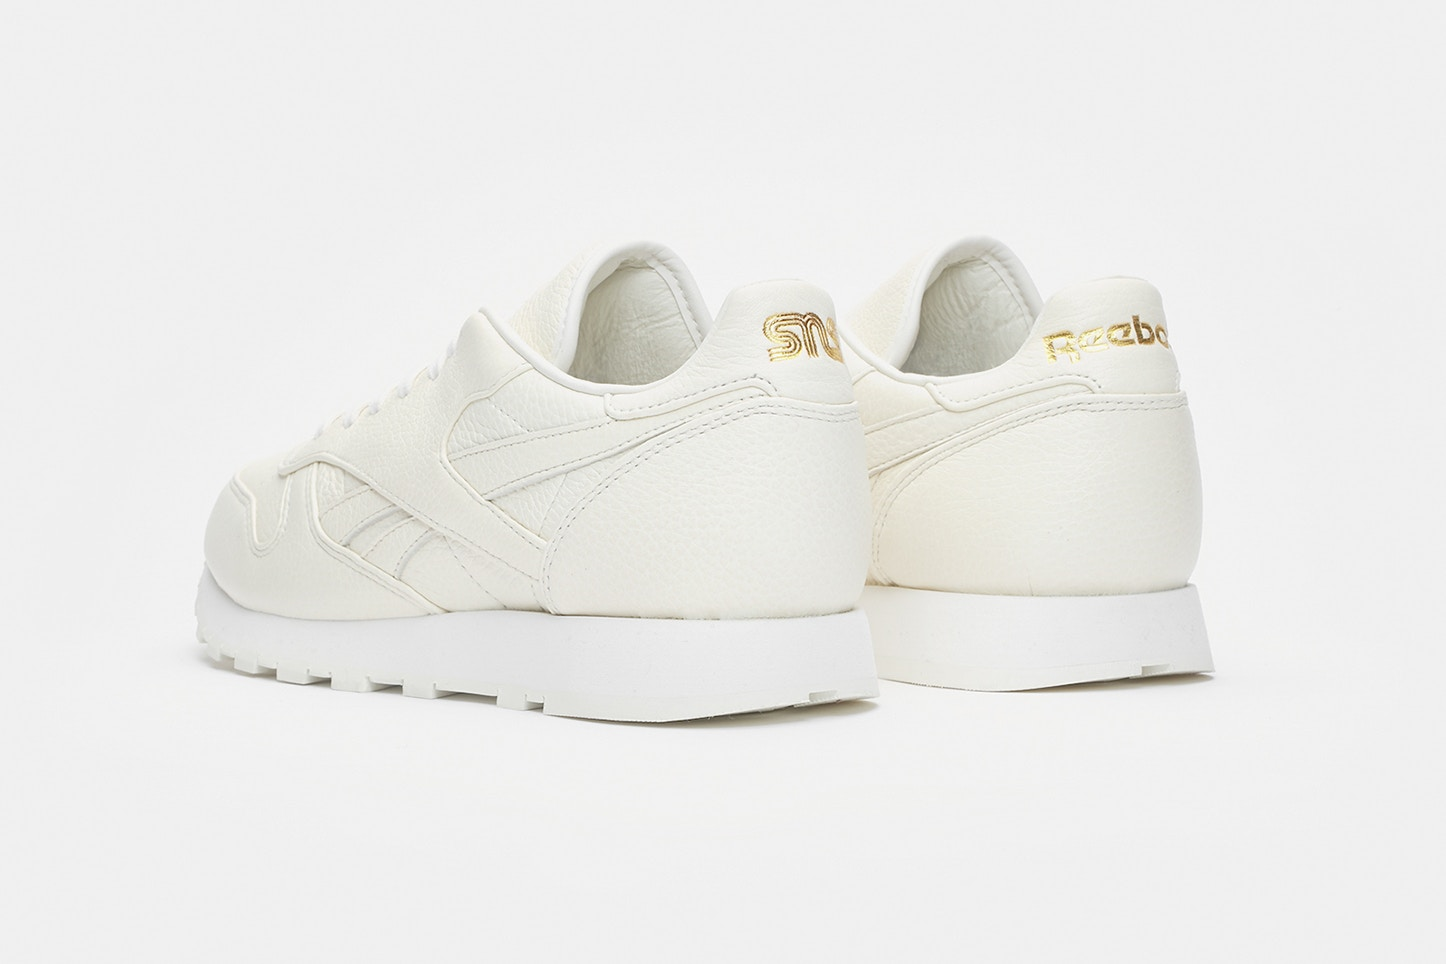 sneakersnstuff x reebok classic leather premium